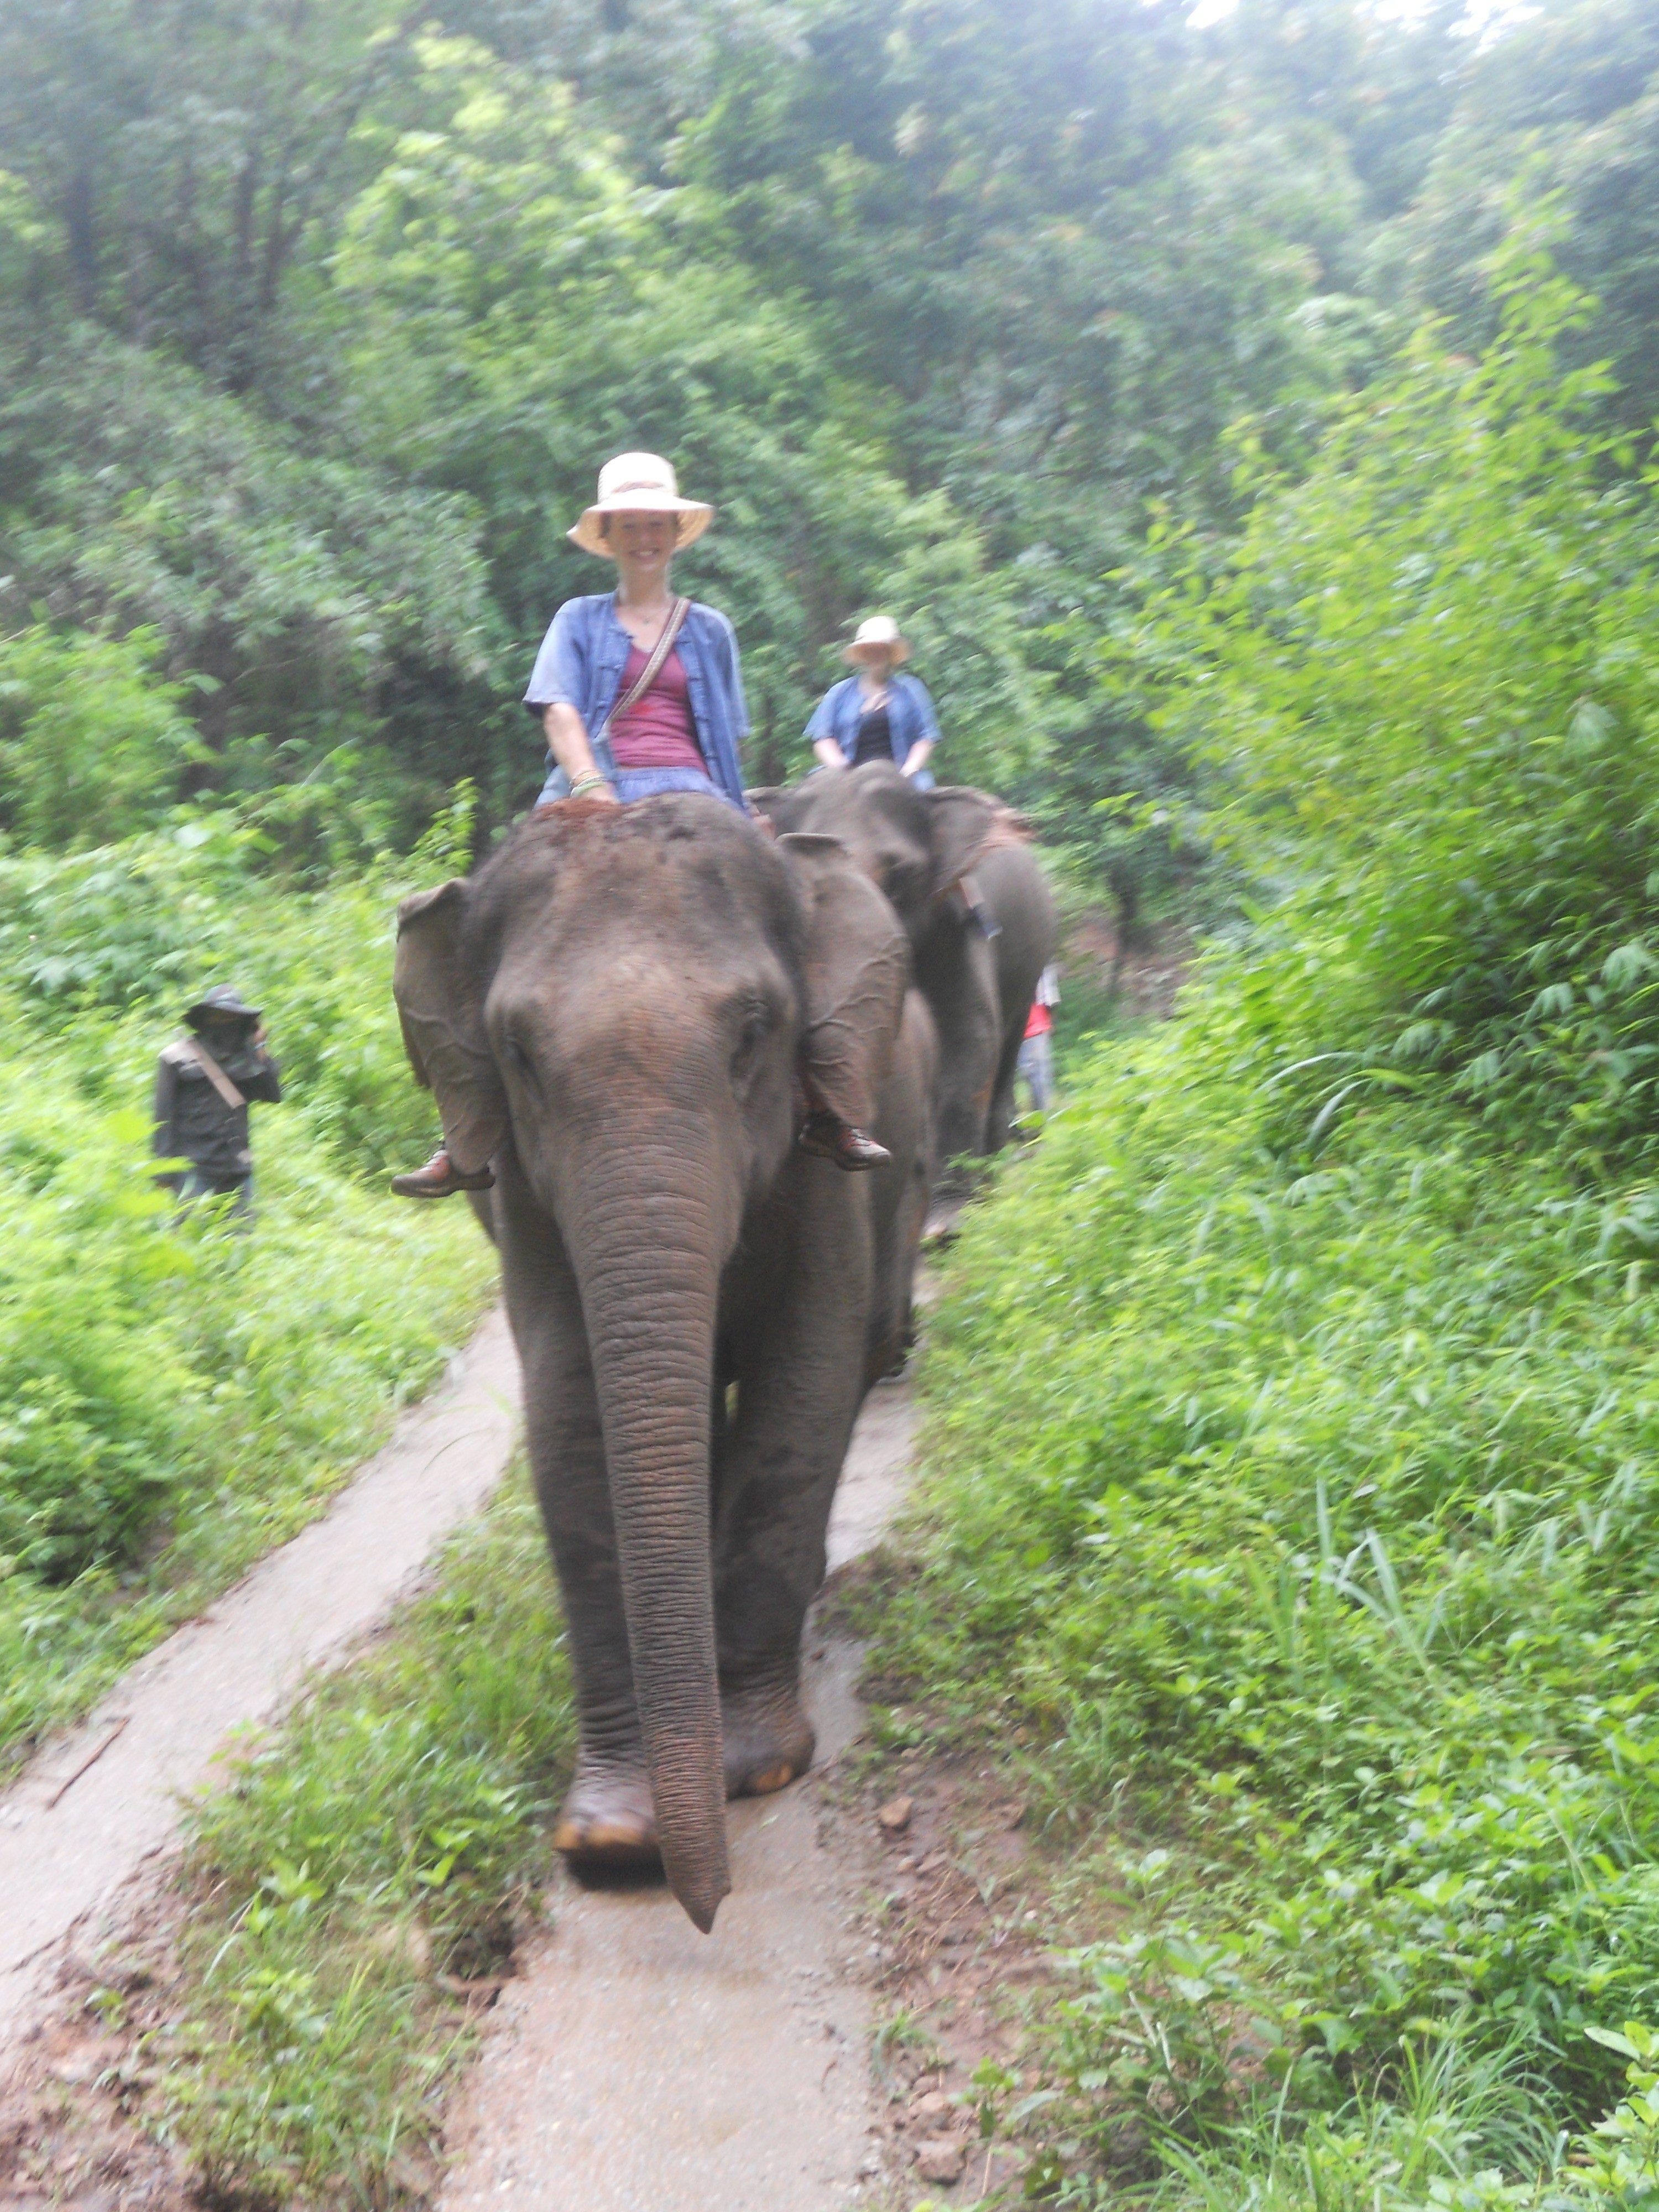 Volunteering with elephants in Thailand.